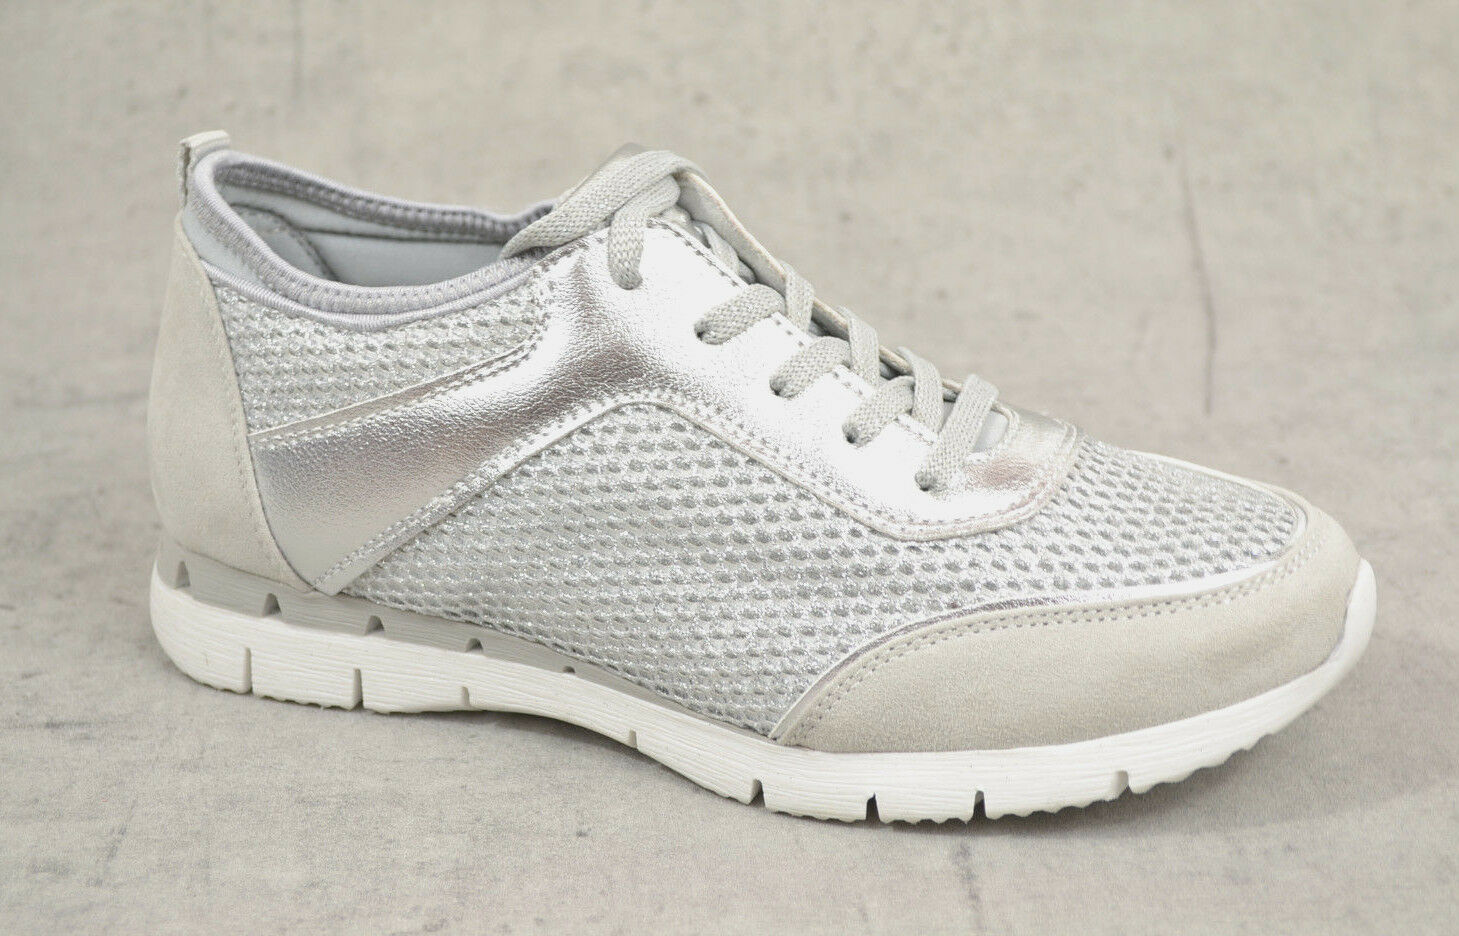 NEU Marco Tozzi Damen Sommer Sneaker Damen Damen Damen Sport Schuhe silber comfort Sneakers 32b25f